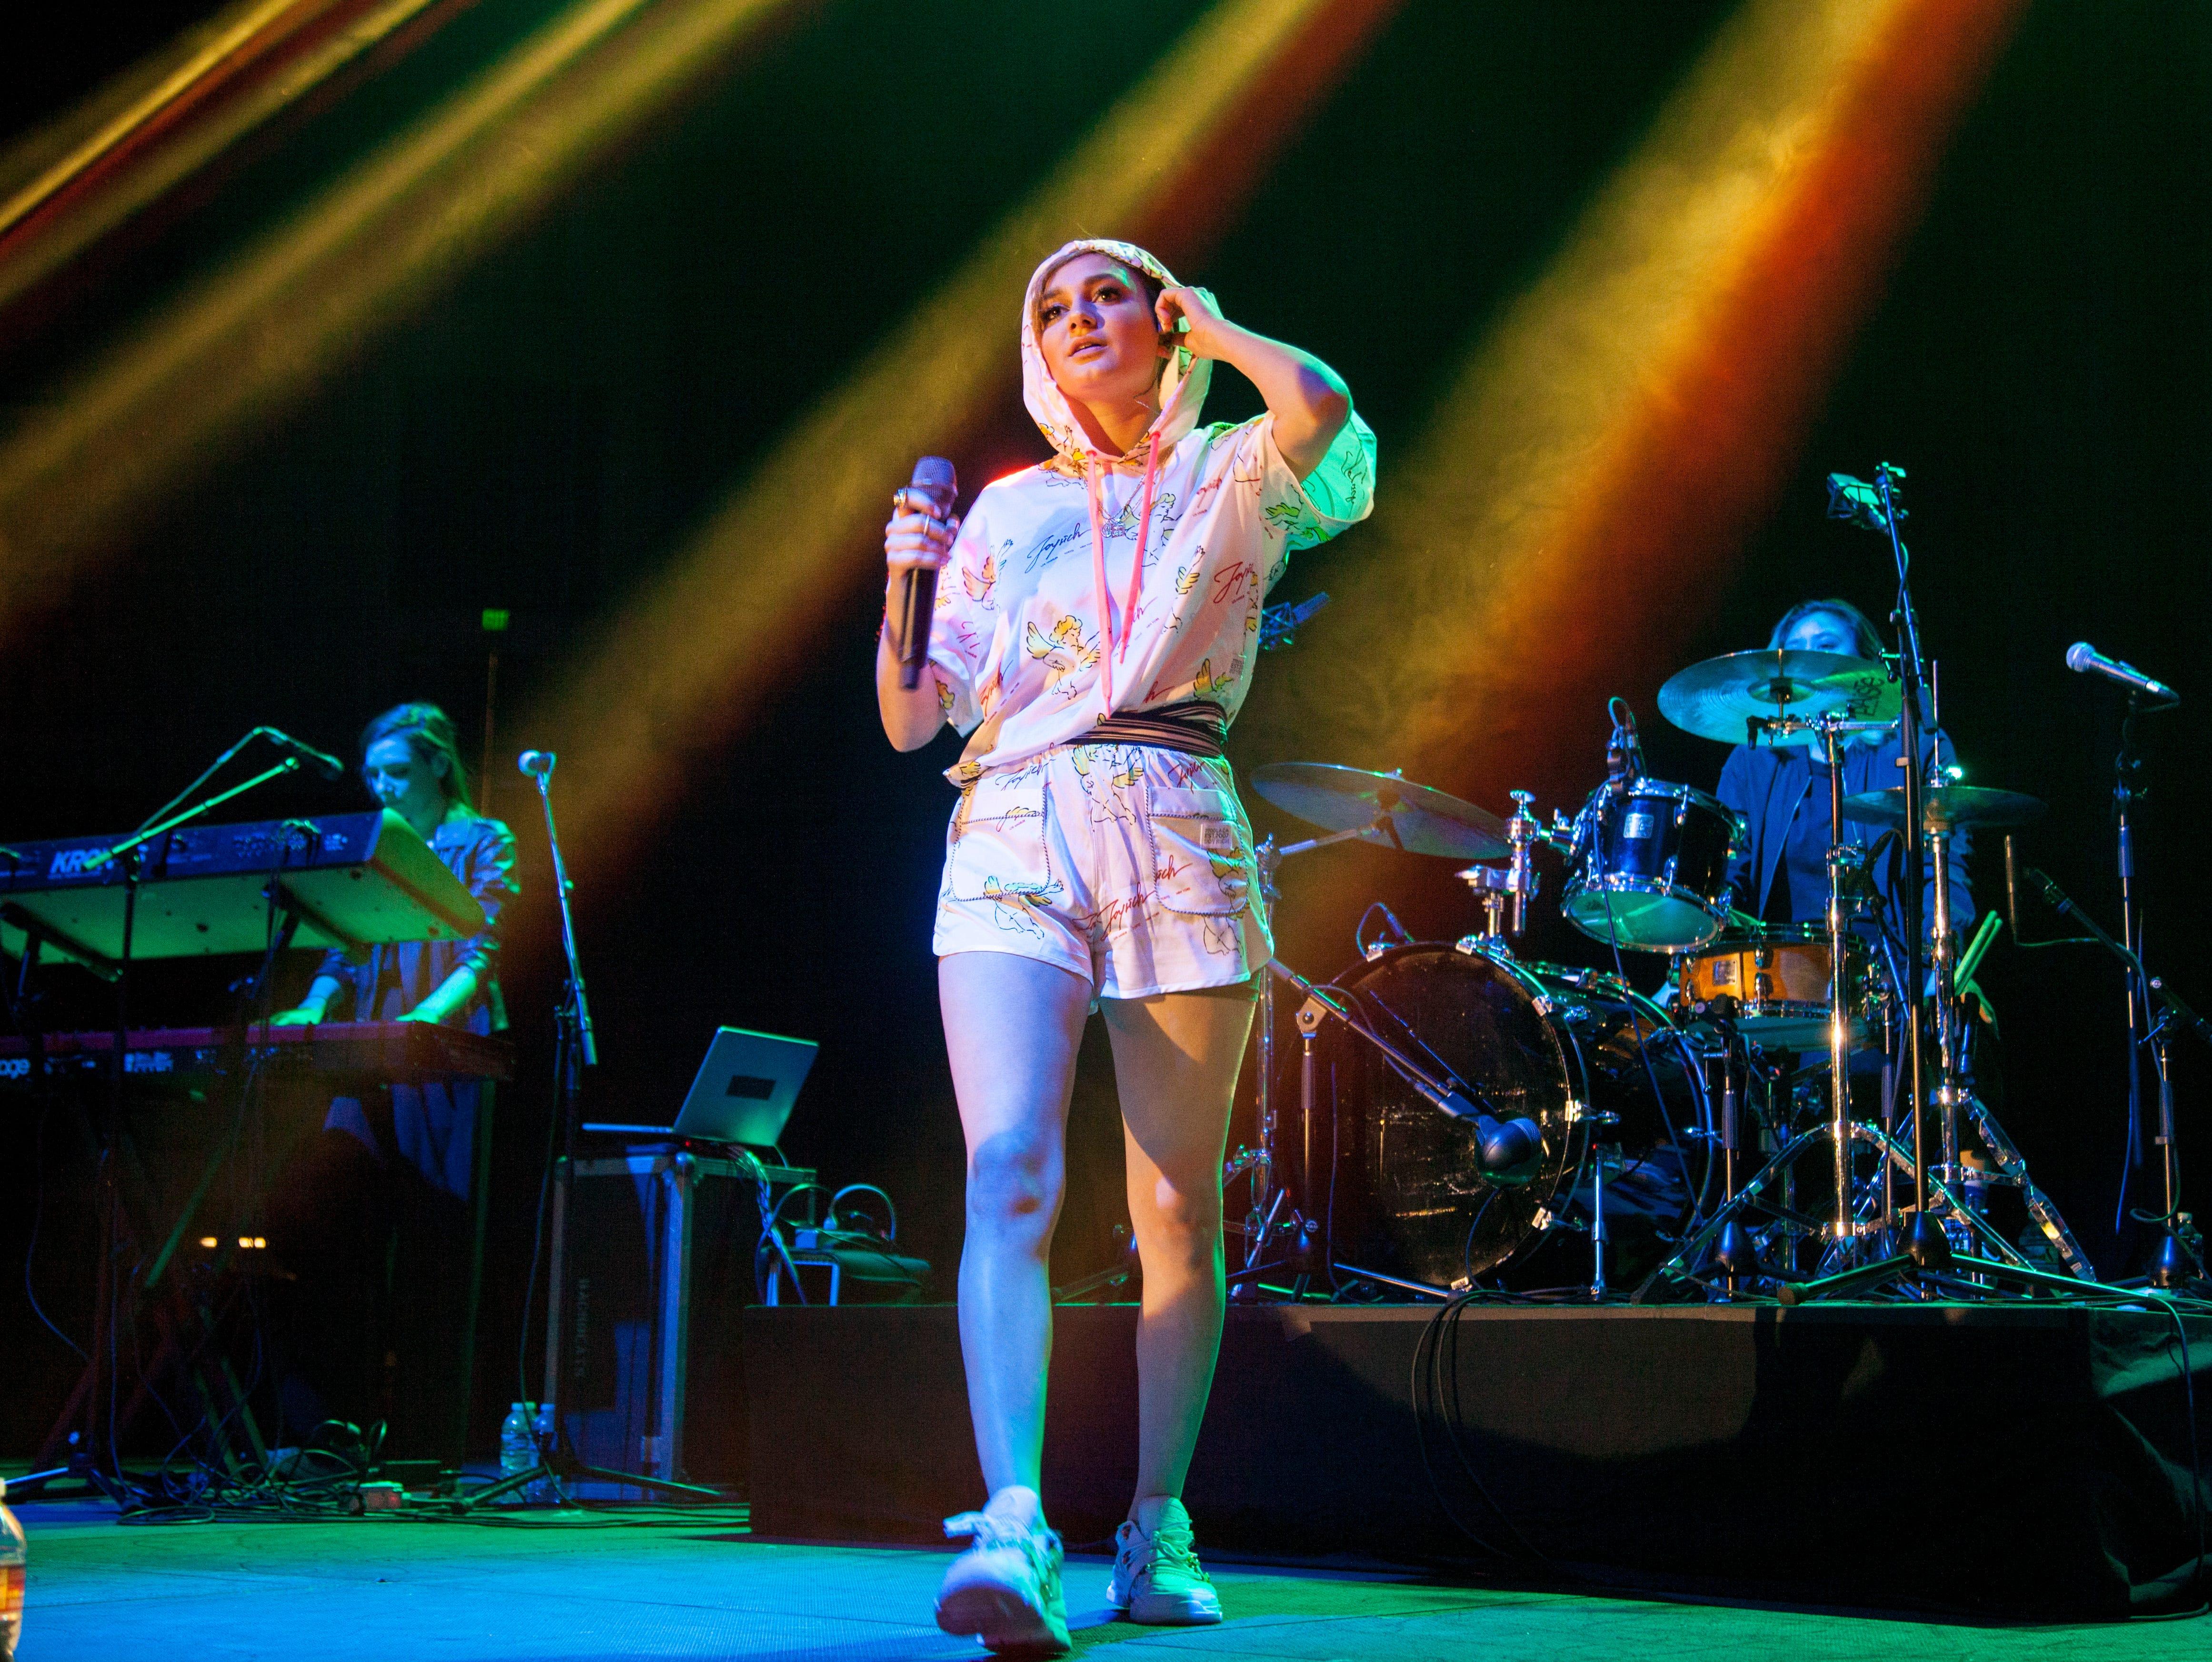 Daya performs at the DSU Burns Arena Friday, Nov. 2, 2018.